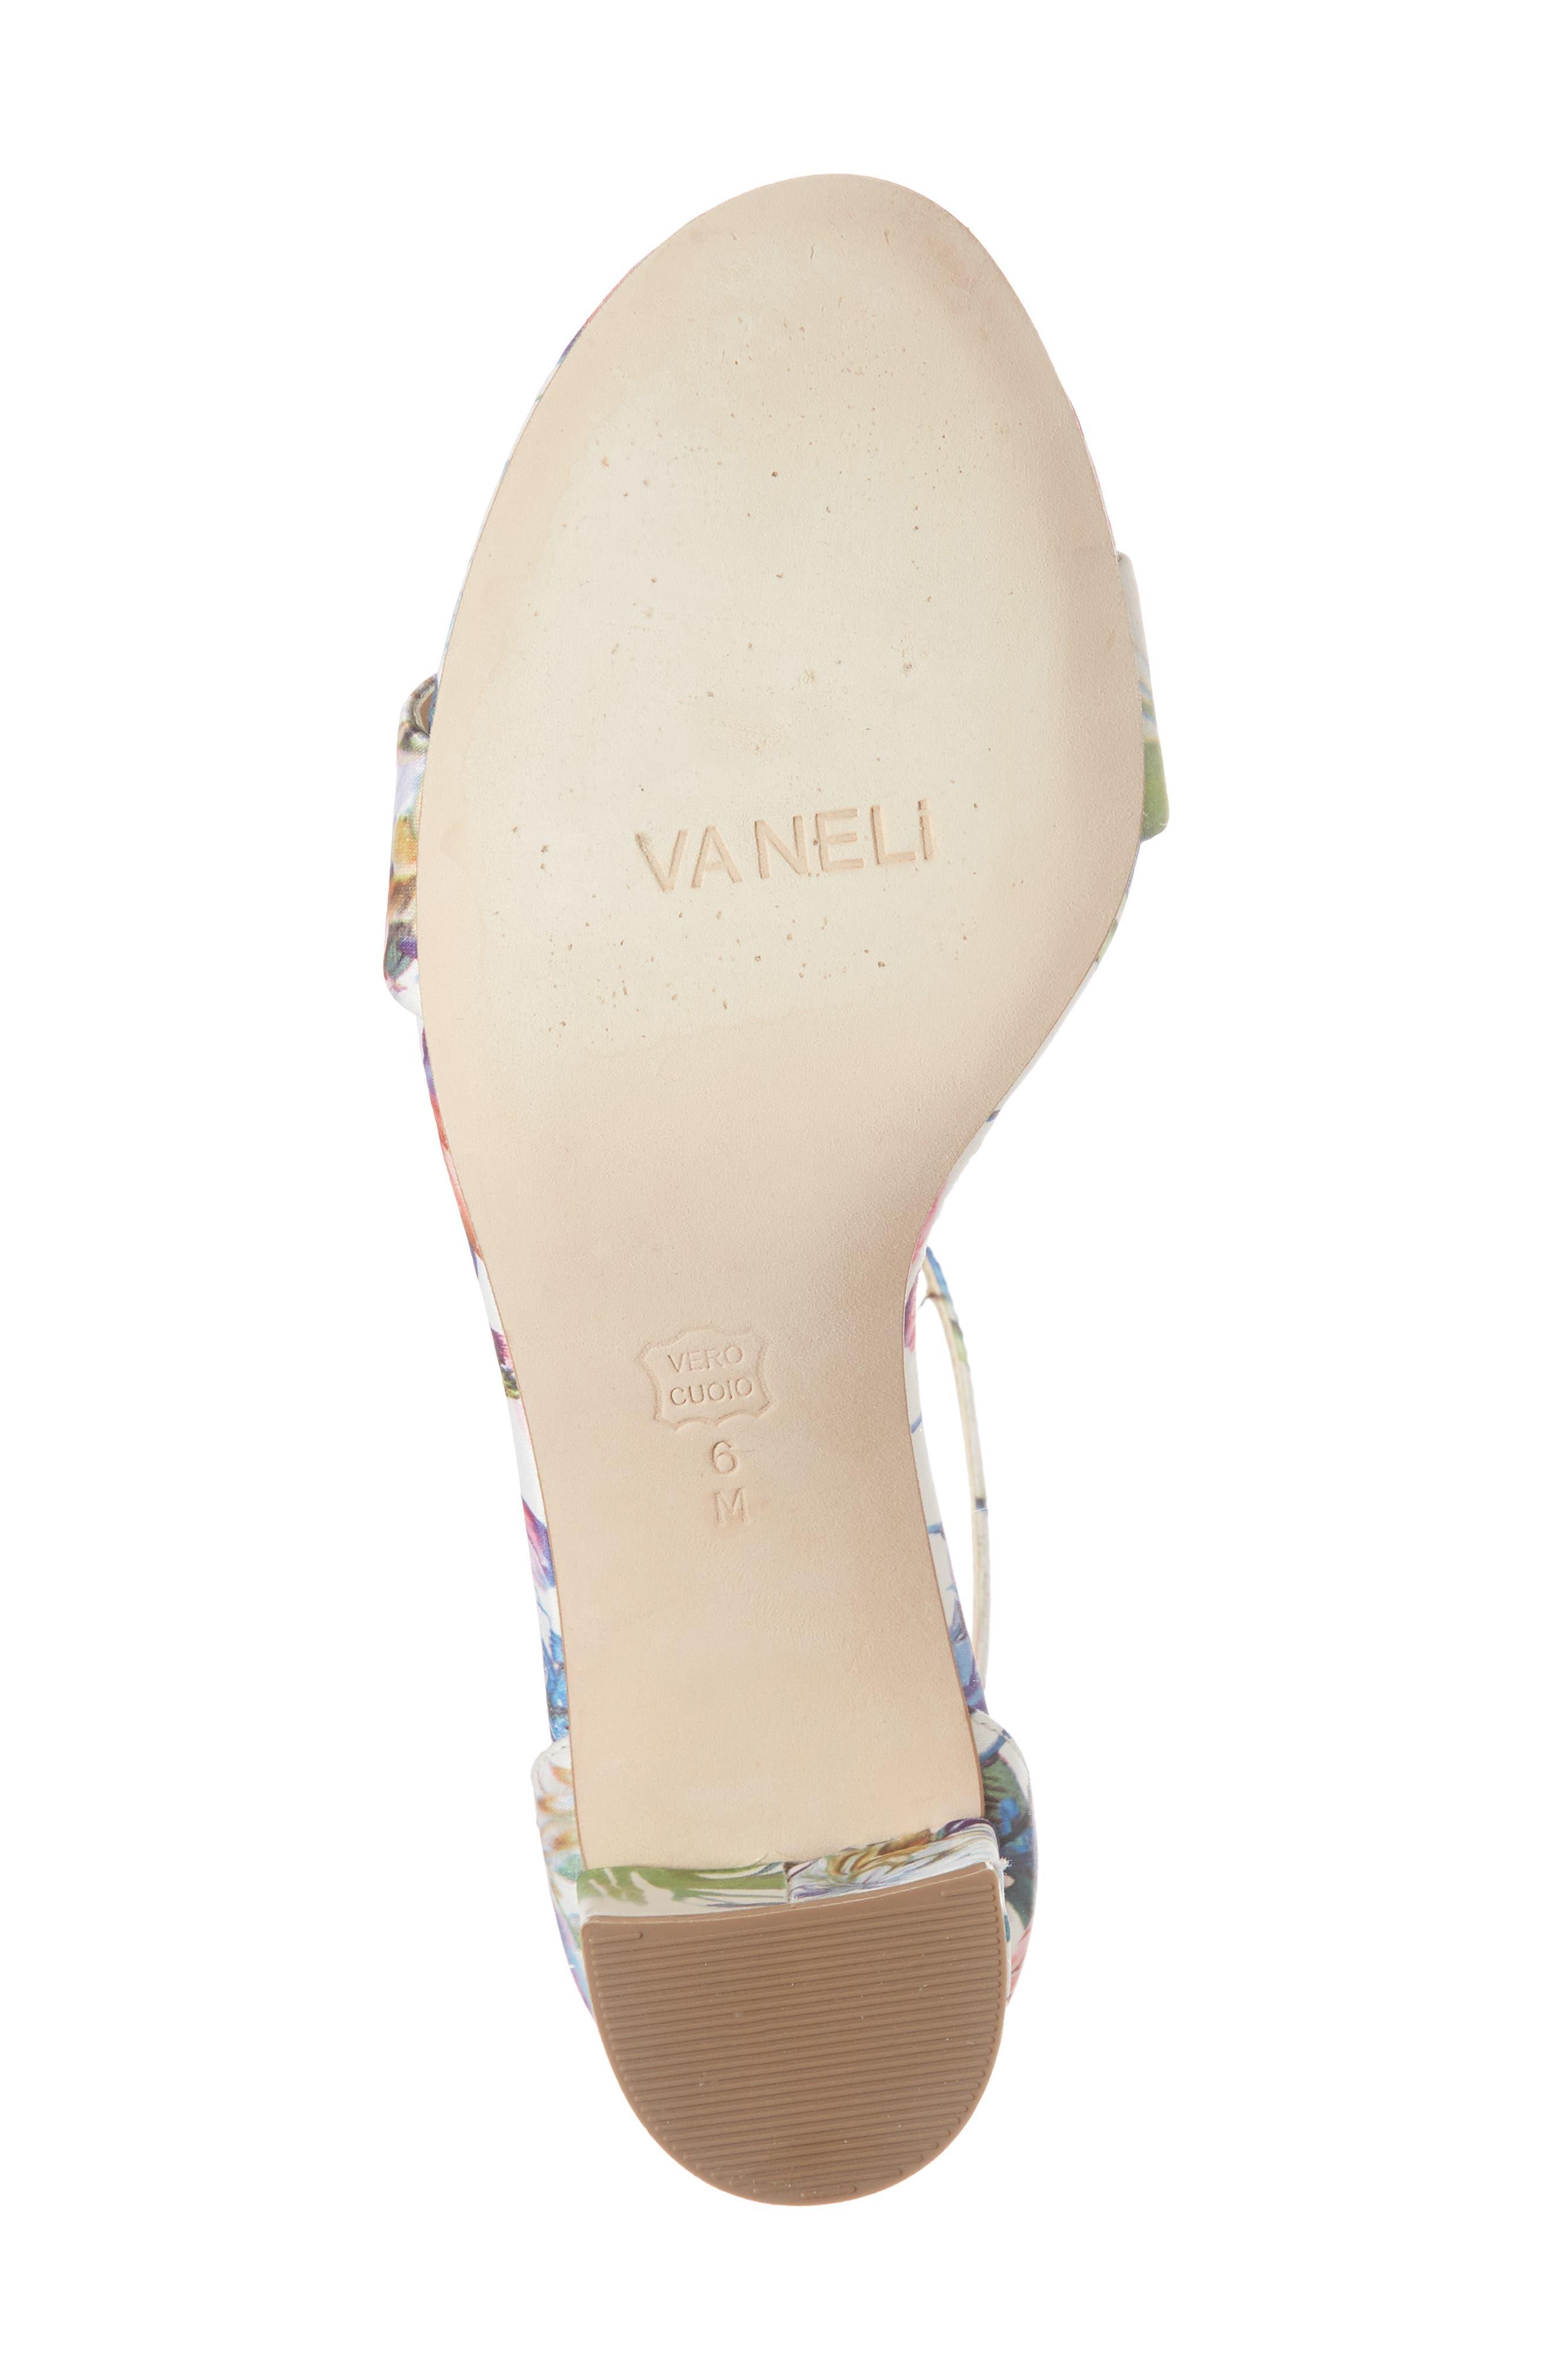 Meres Ankle Strap Sandal,                             Alternate thumbnail 6, color,                             400